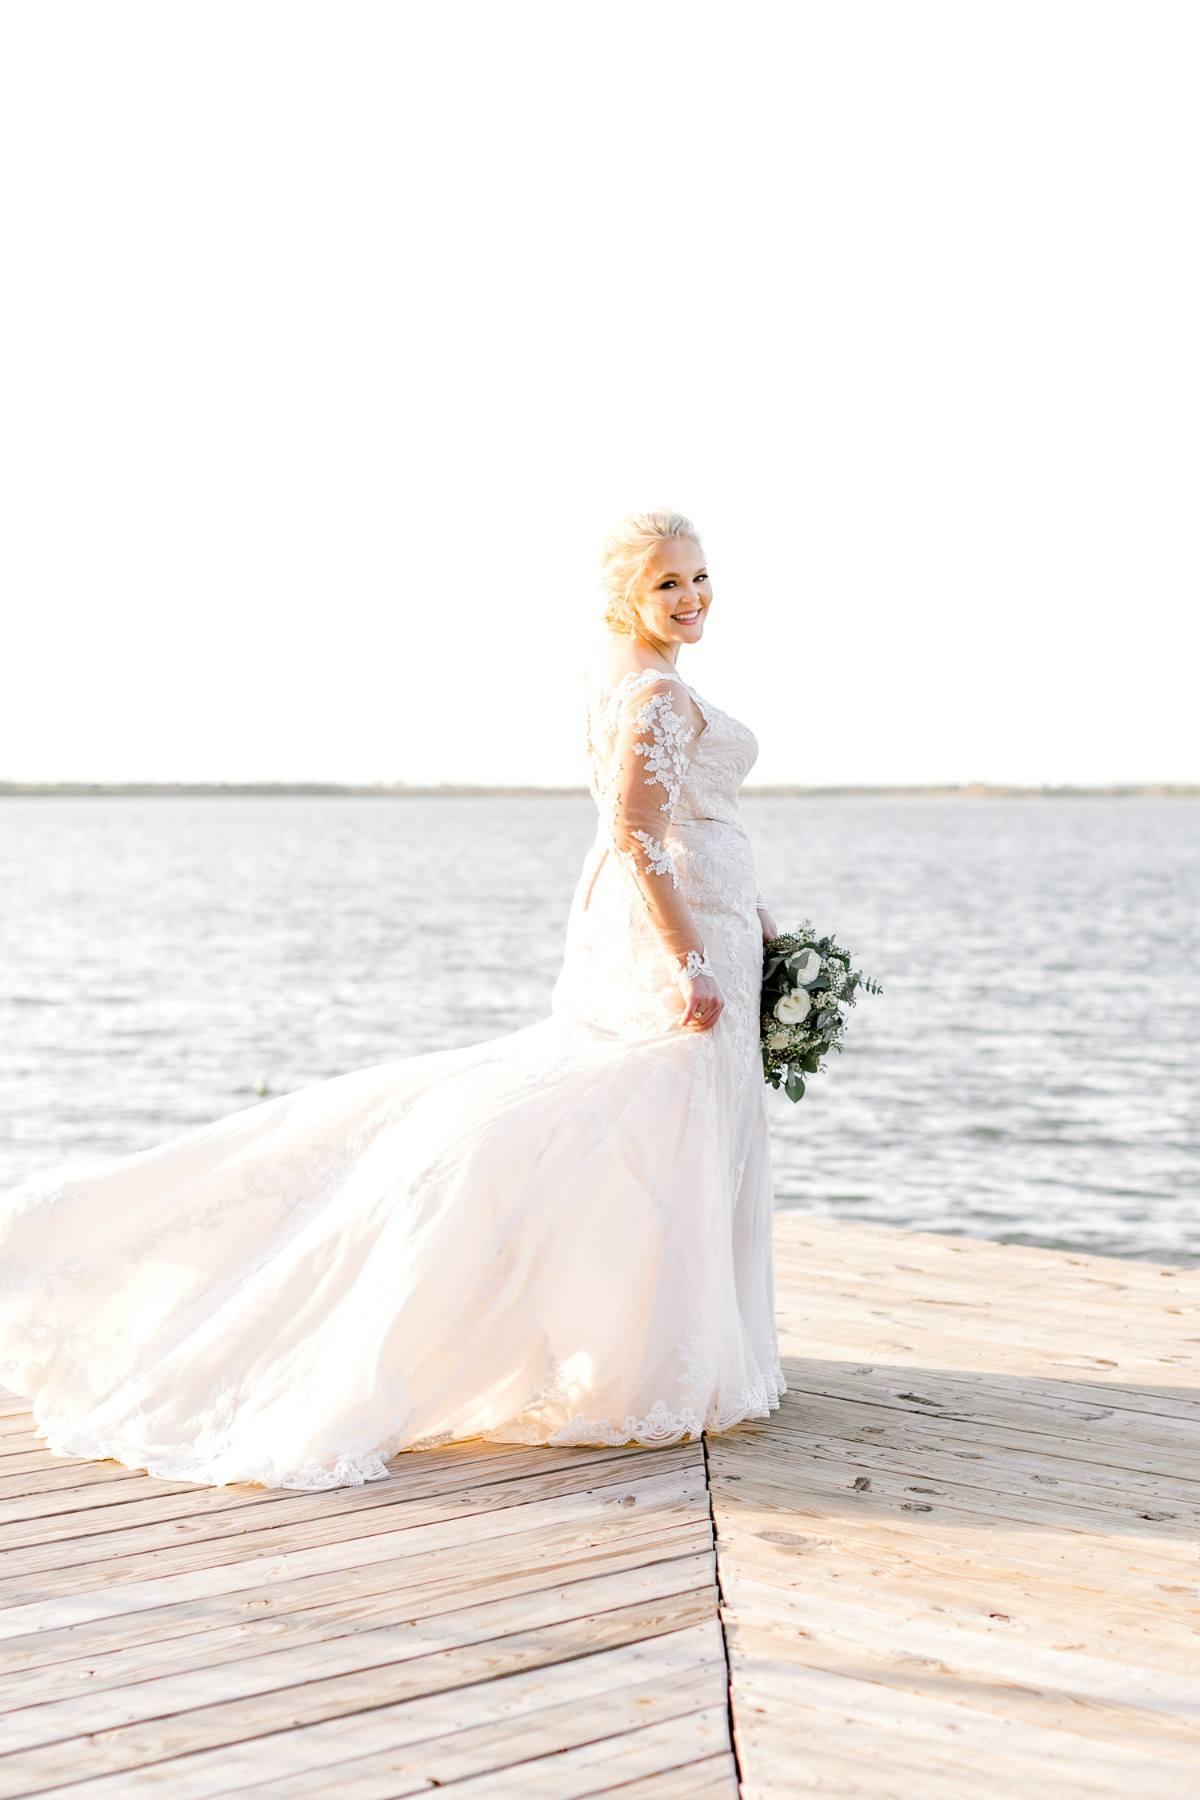 casidy-bridals-tradinghouse-lake-waco-wedding-photographer-kaitlyn-bullard-18.jpg